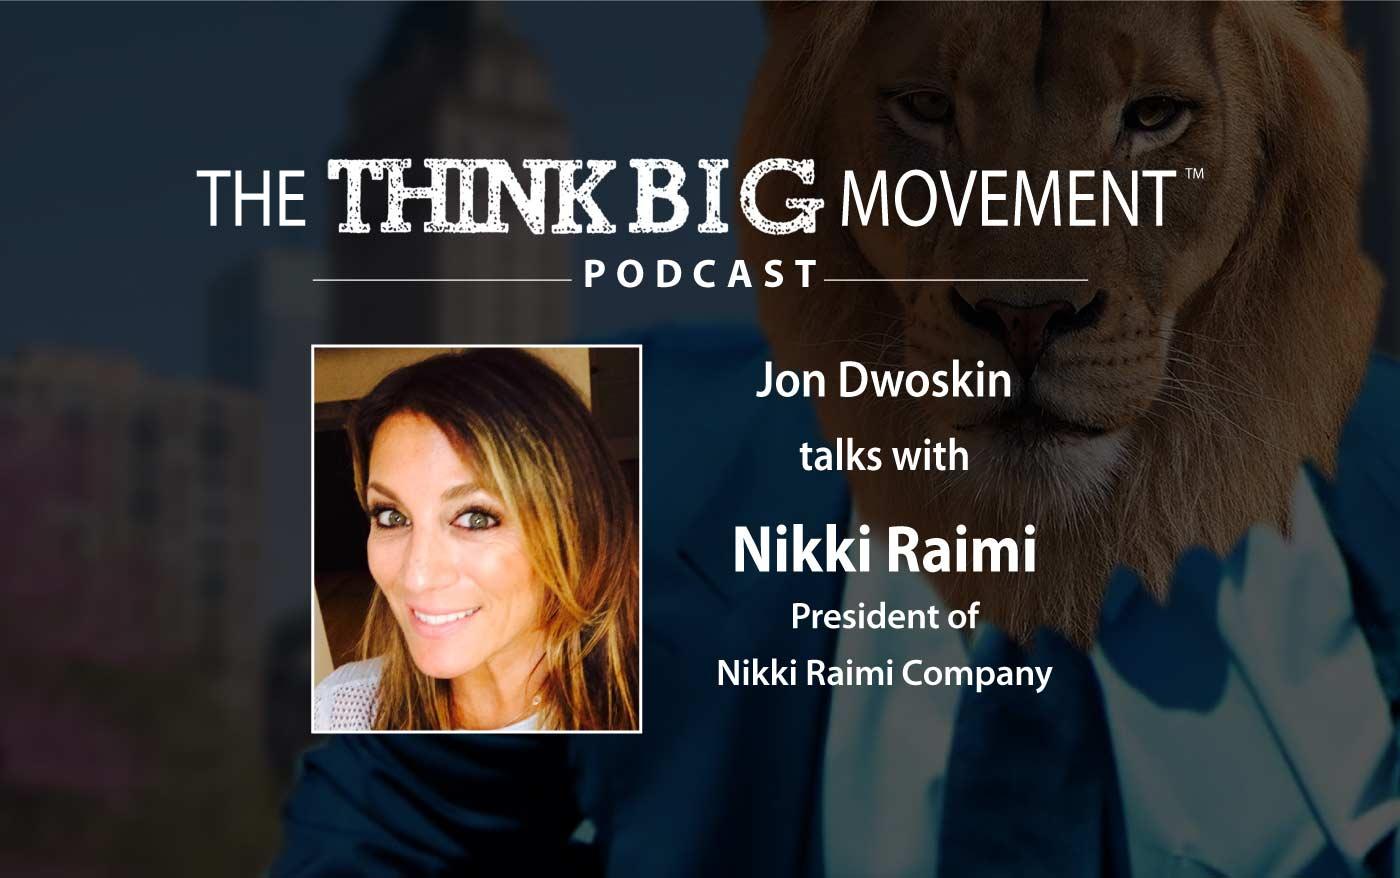 Think Big Movement Podcast - Jon Dwoskin Interviews Nikki Raimi, President of Nikki Raimi Company